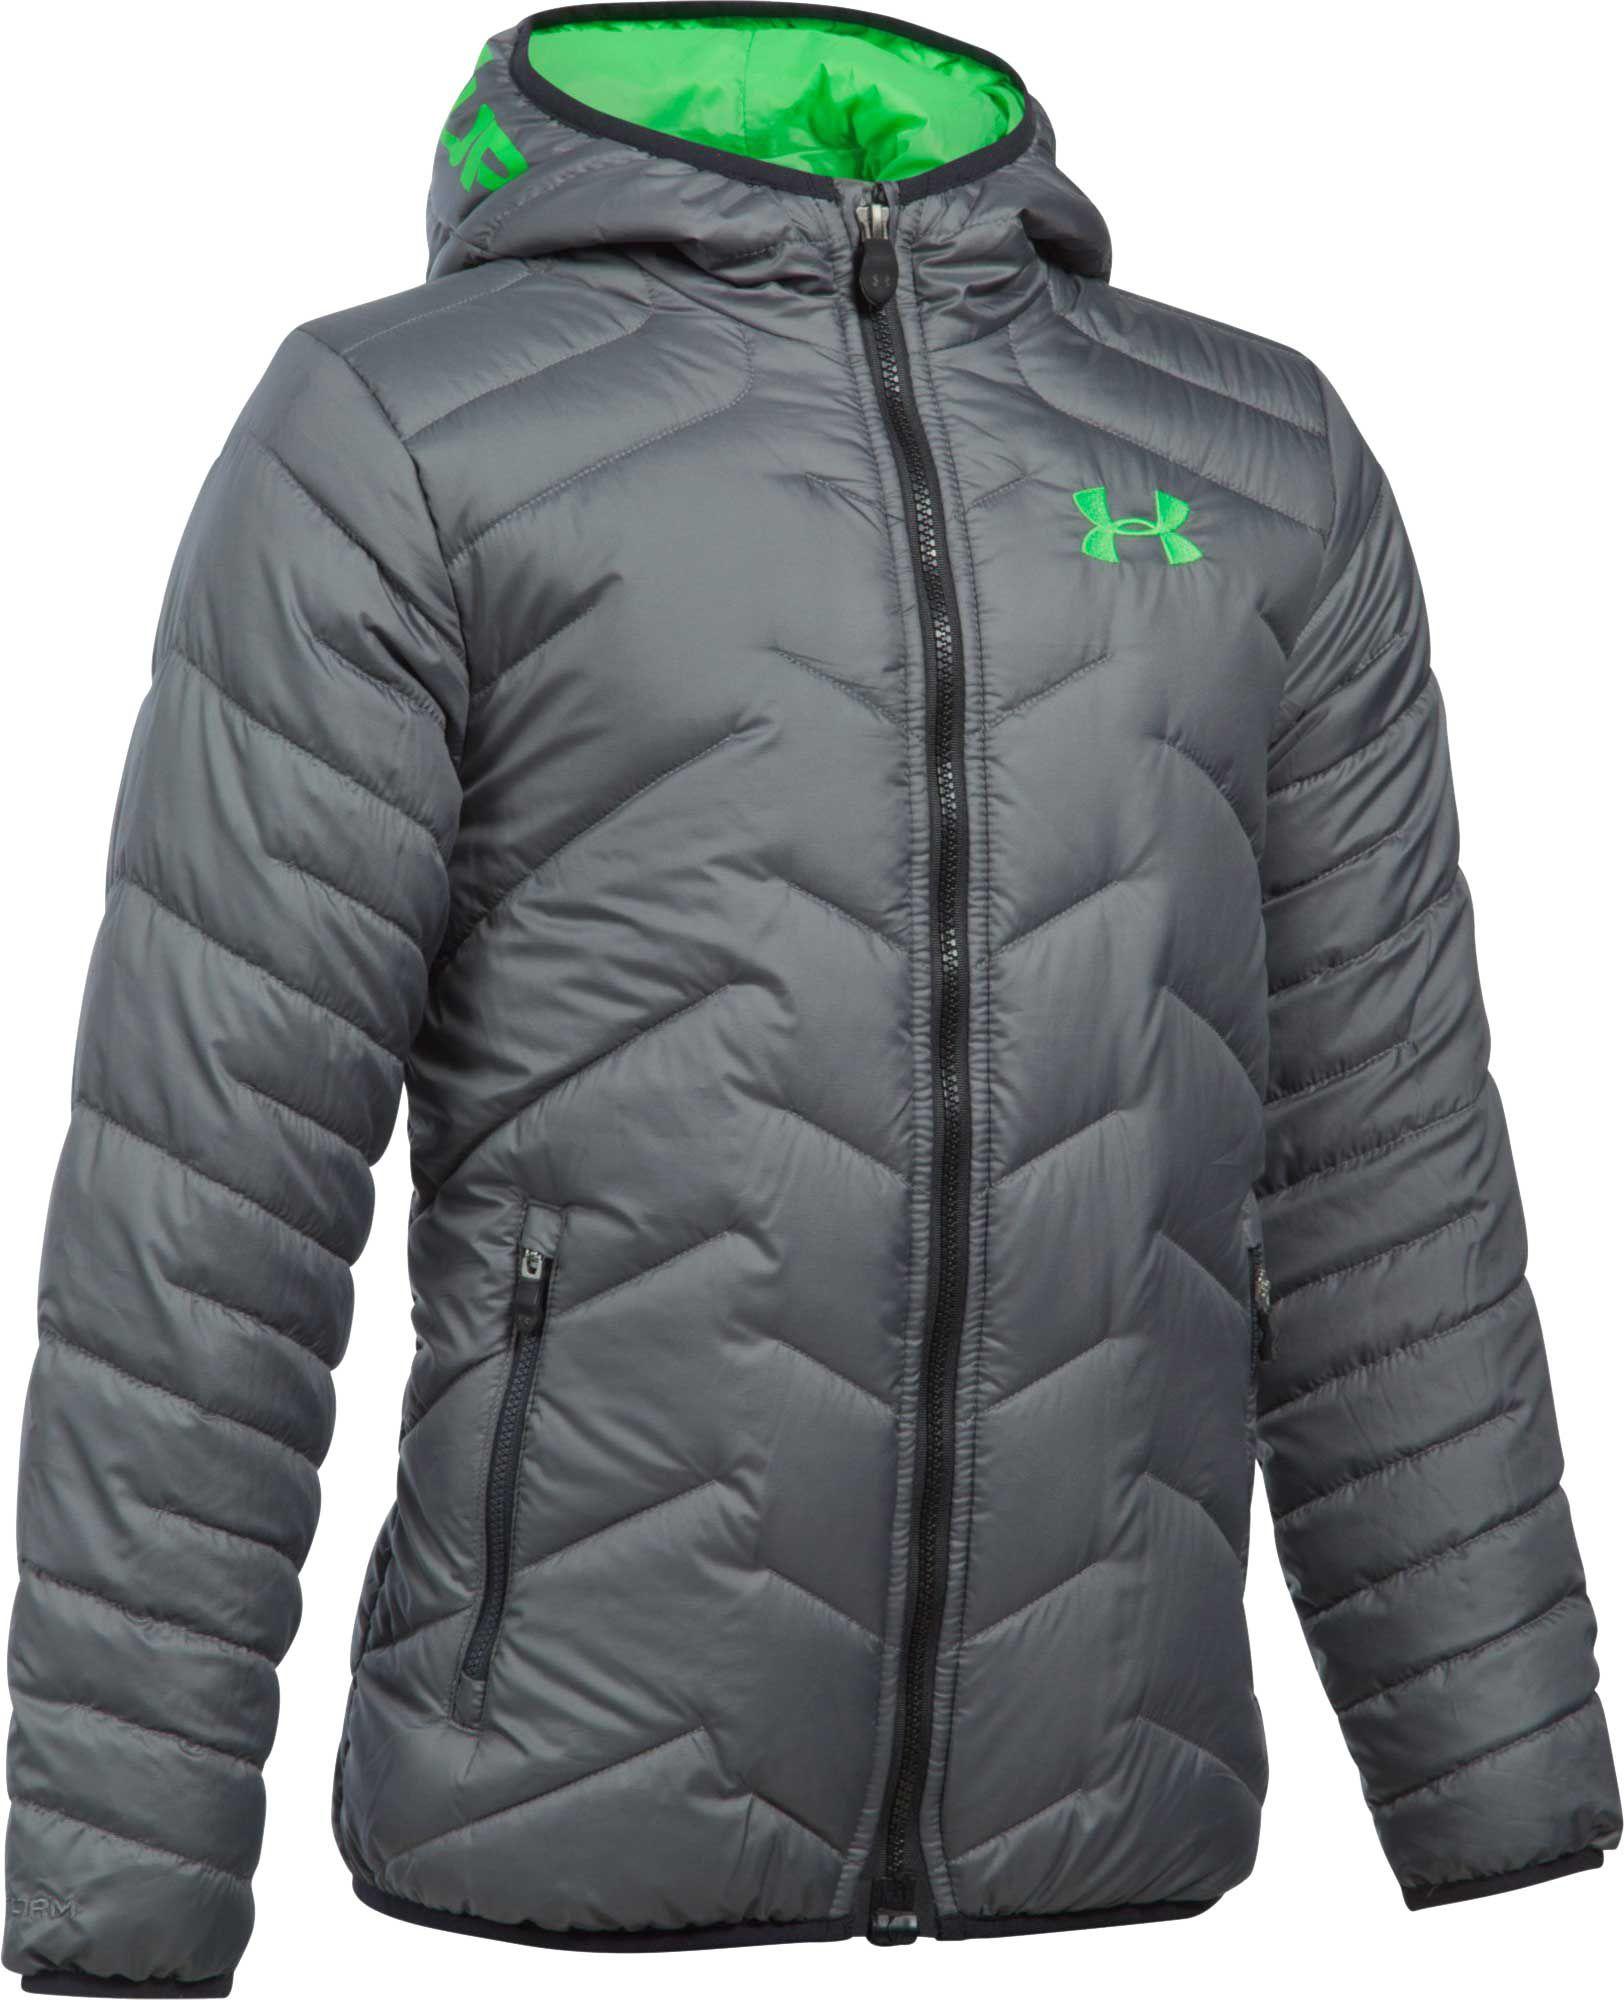 boys jackets noimagefound ??? ldglpjc